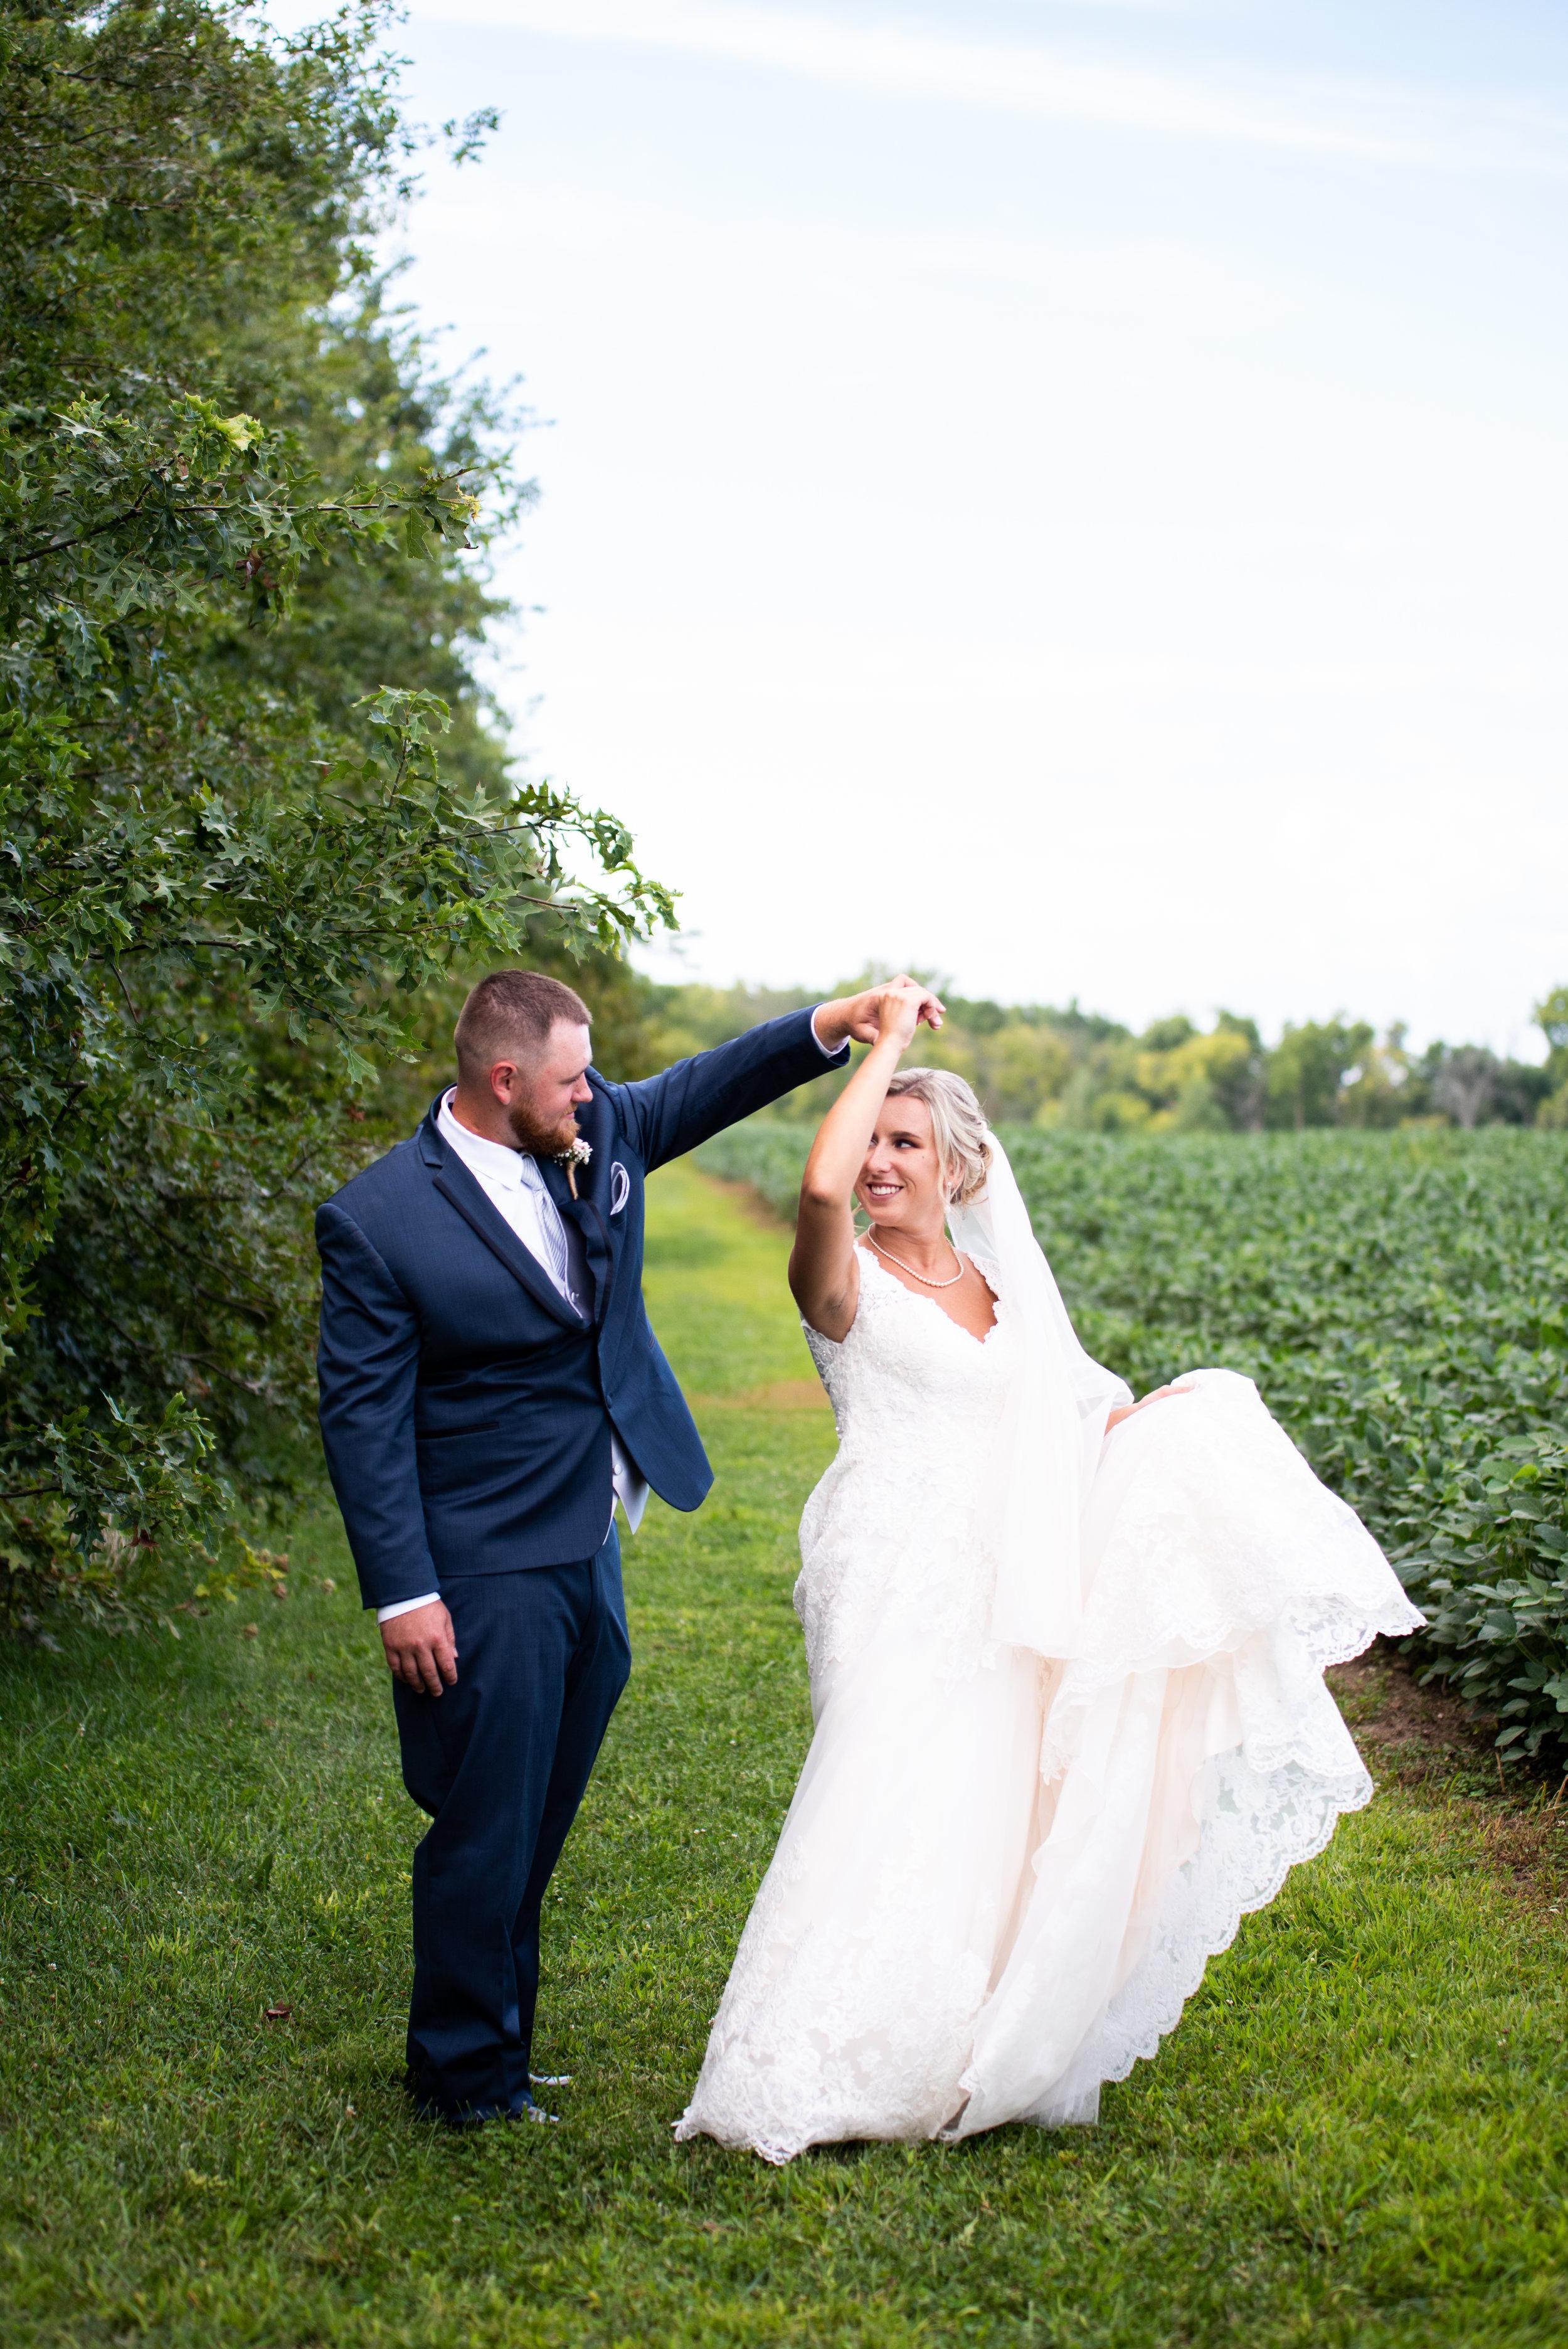 wedding (1 of 1)-161.jpg